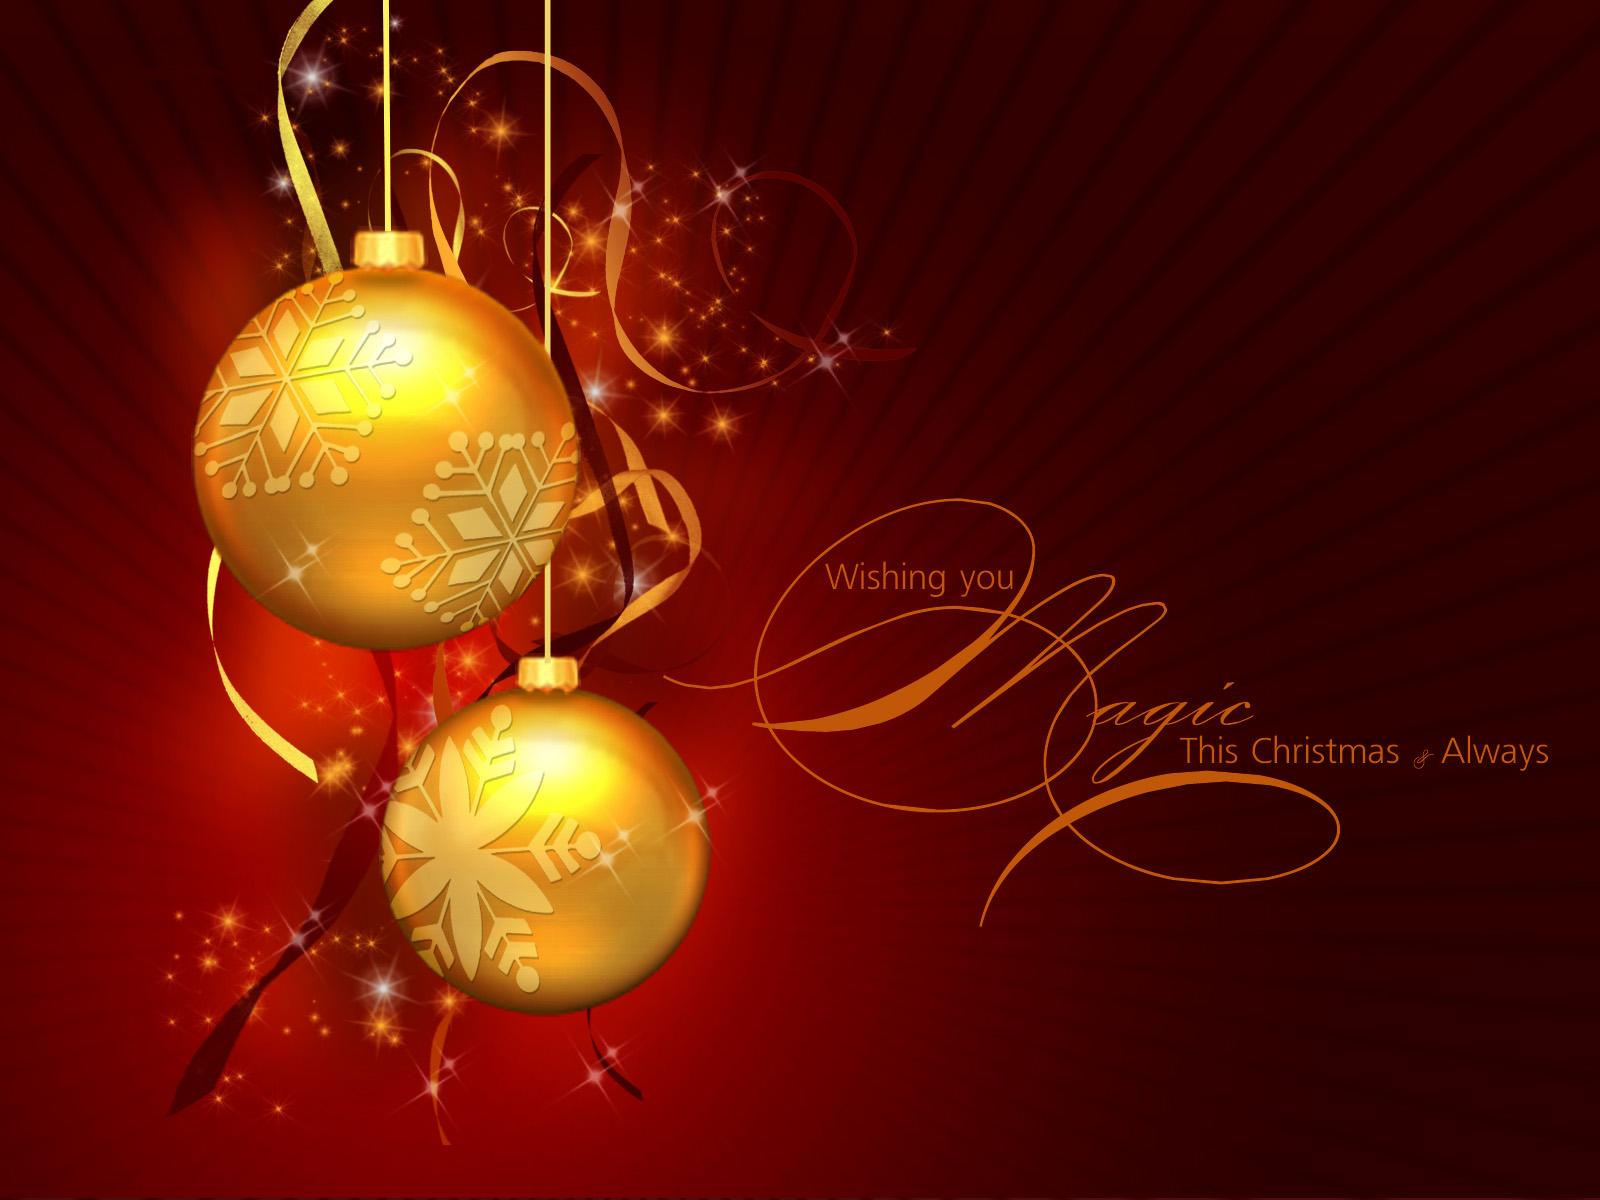 78] Christmas Desktop Wallpaper on WallpaperSafari 1600x1200